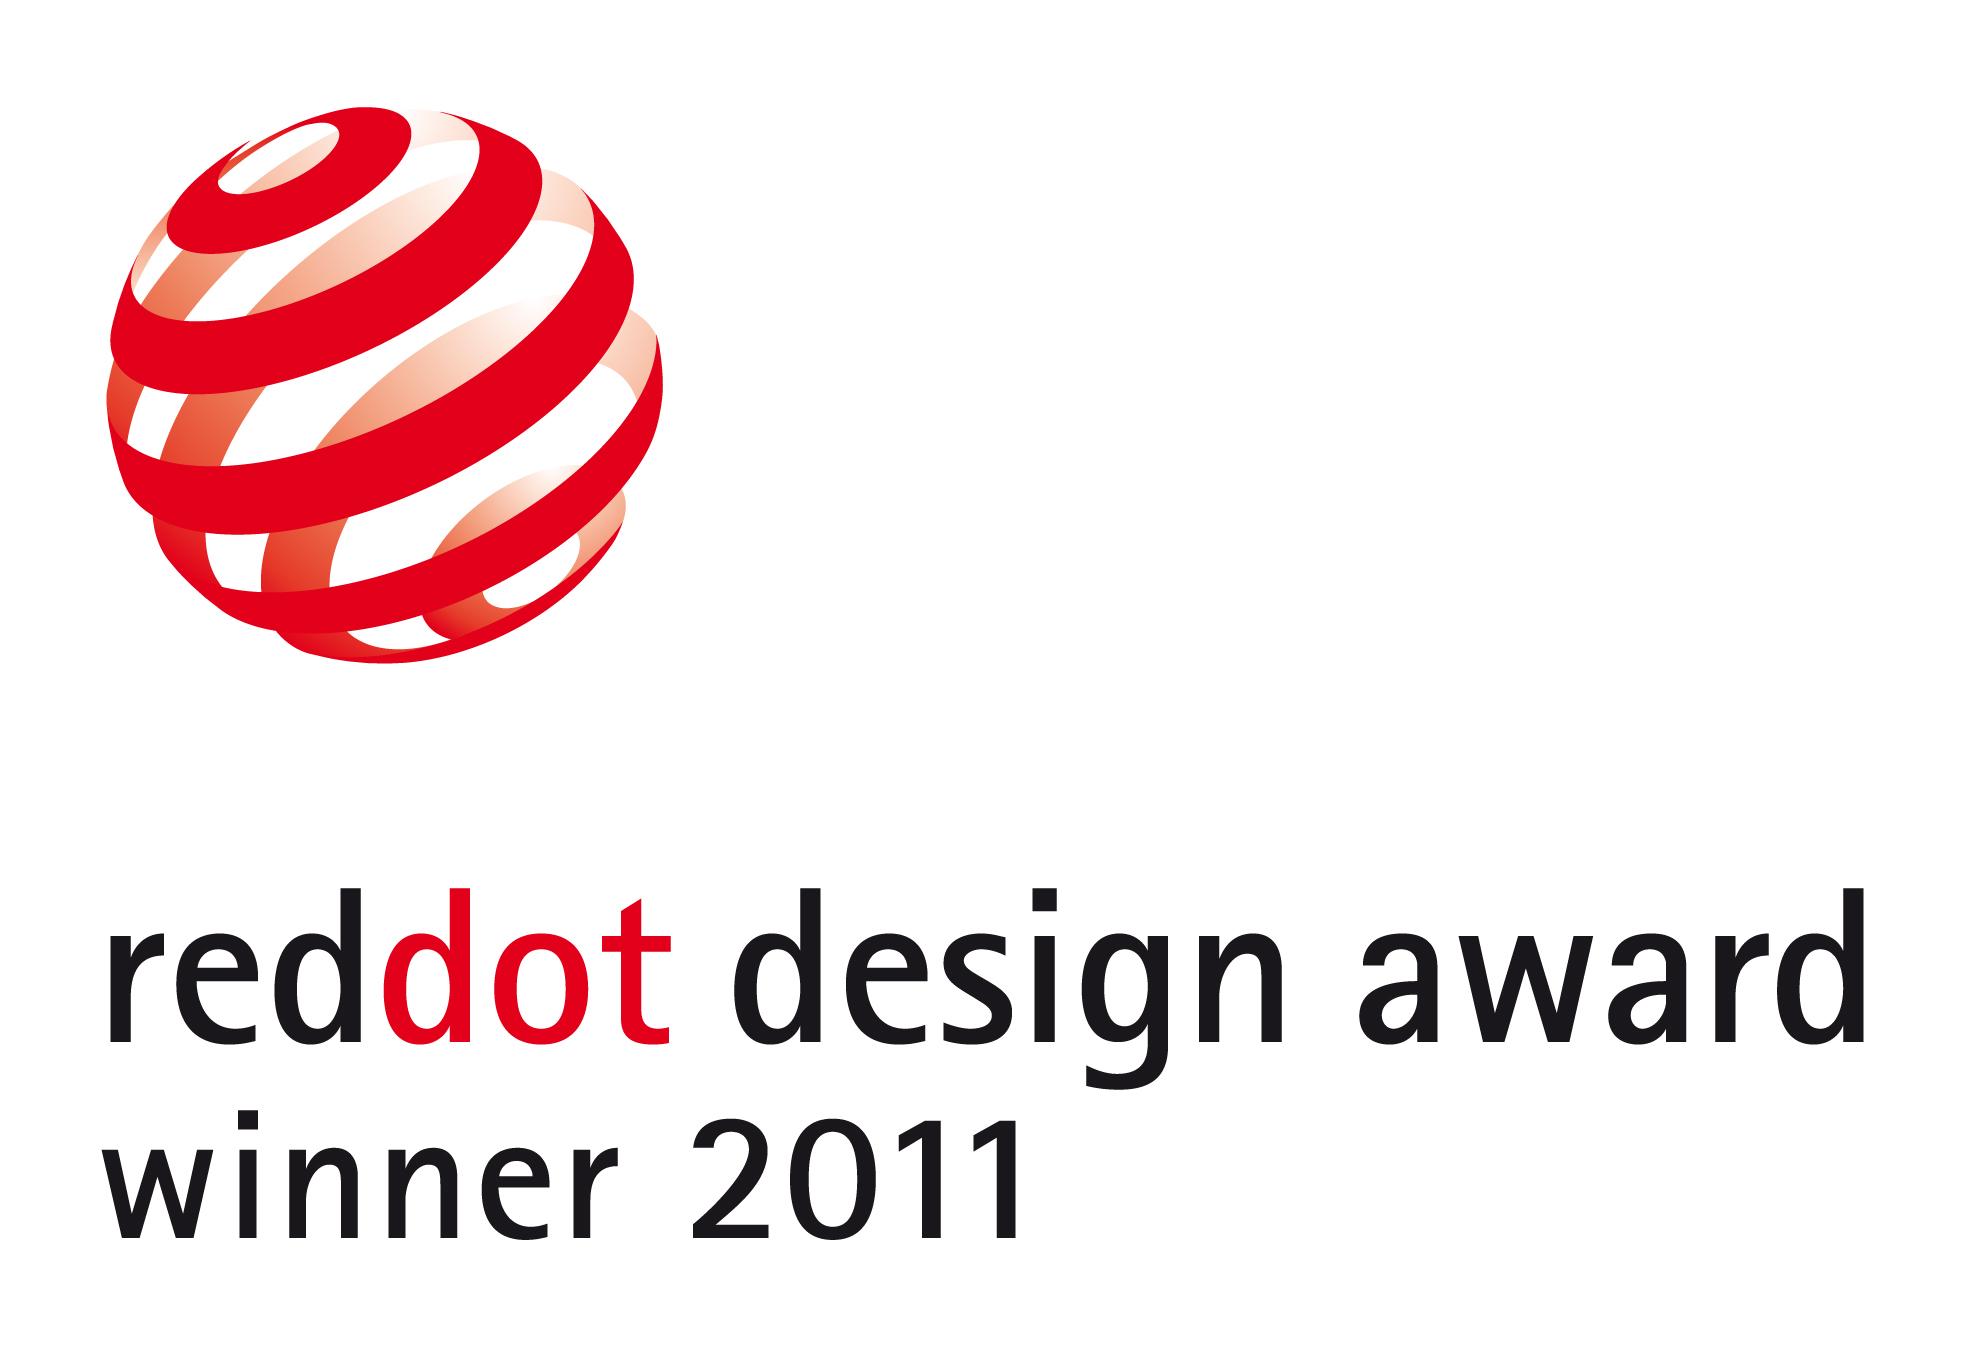 Ipad 2010 work red dot award product design - Gorillatorch Switchback Wins Red Dot 2011 Award